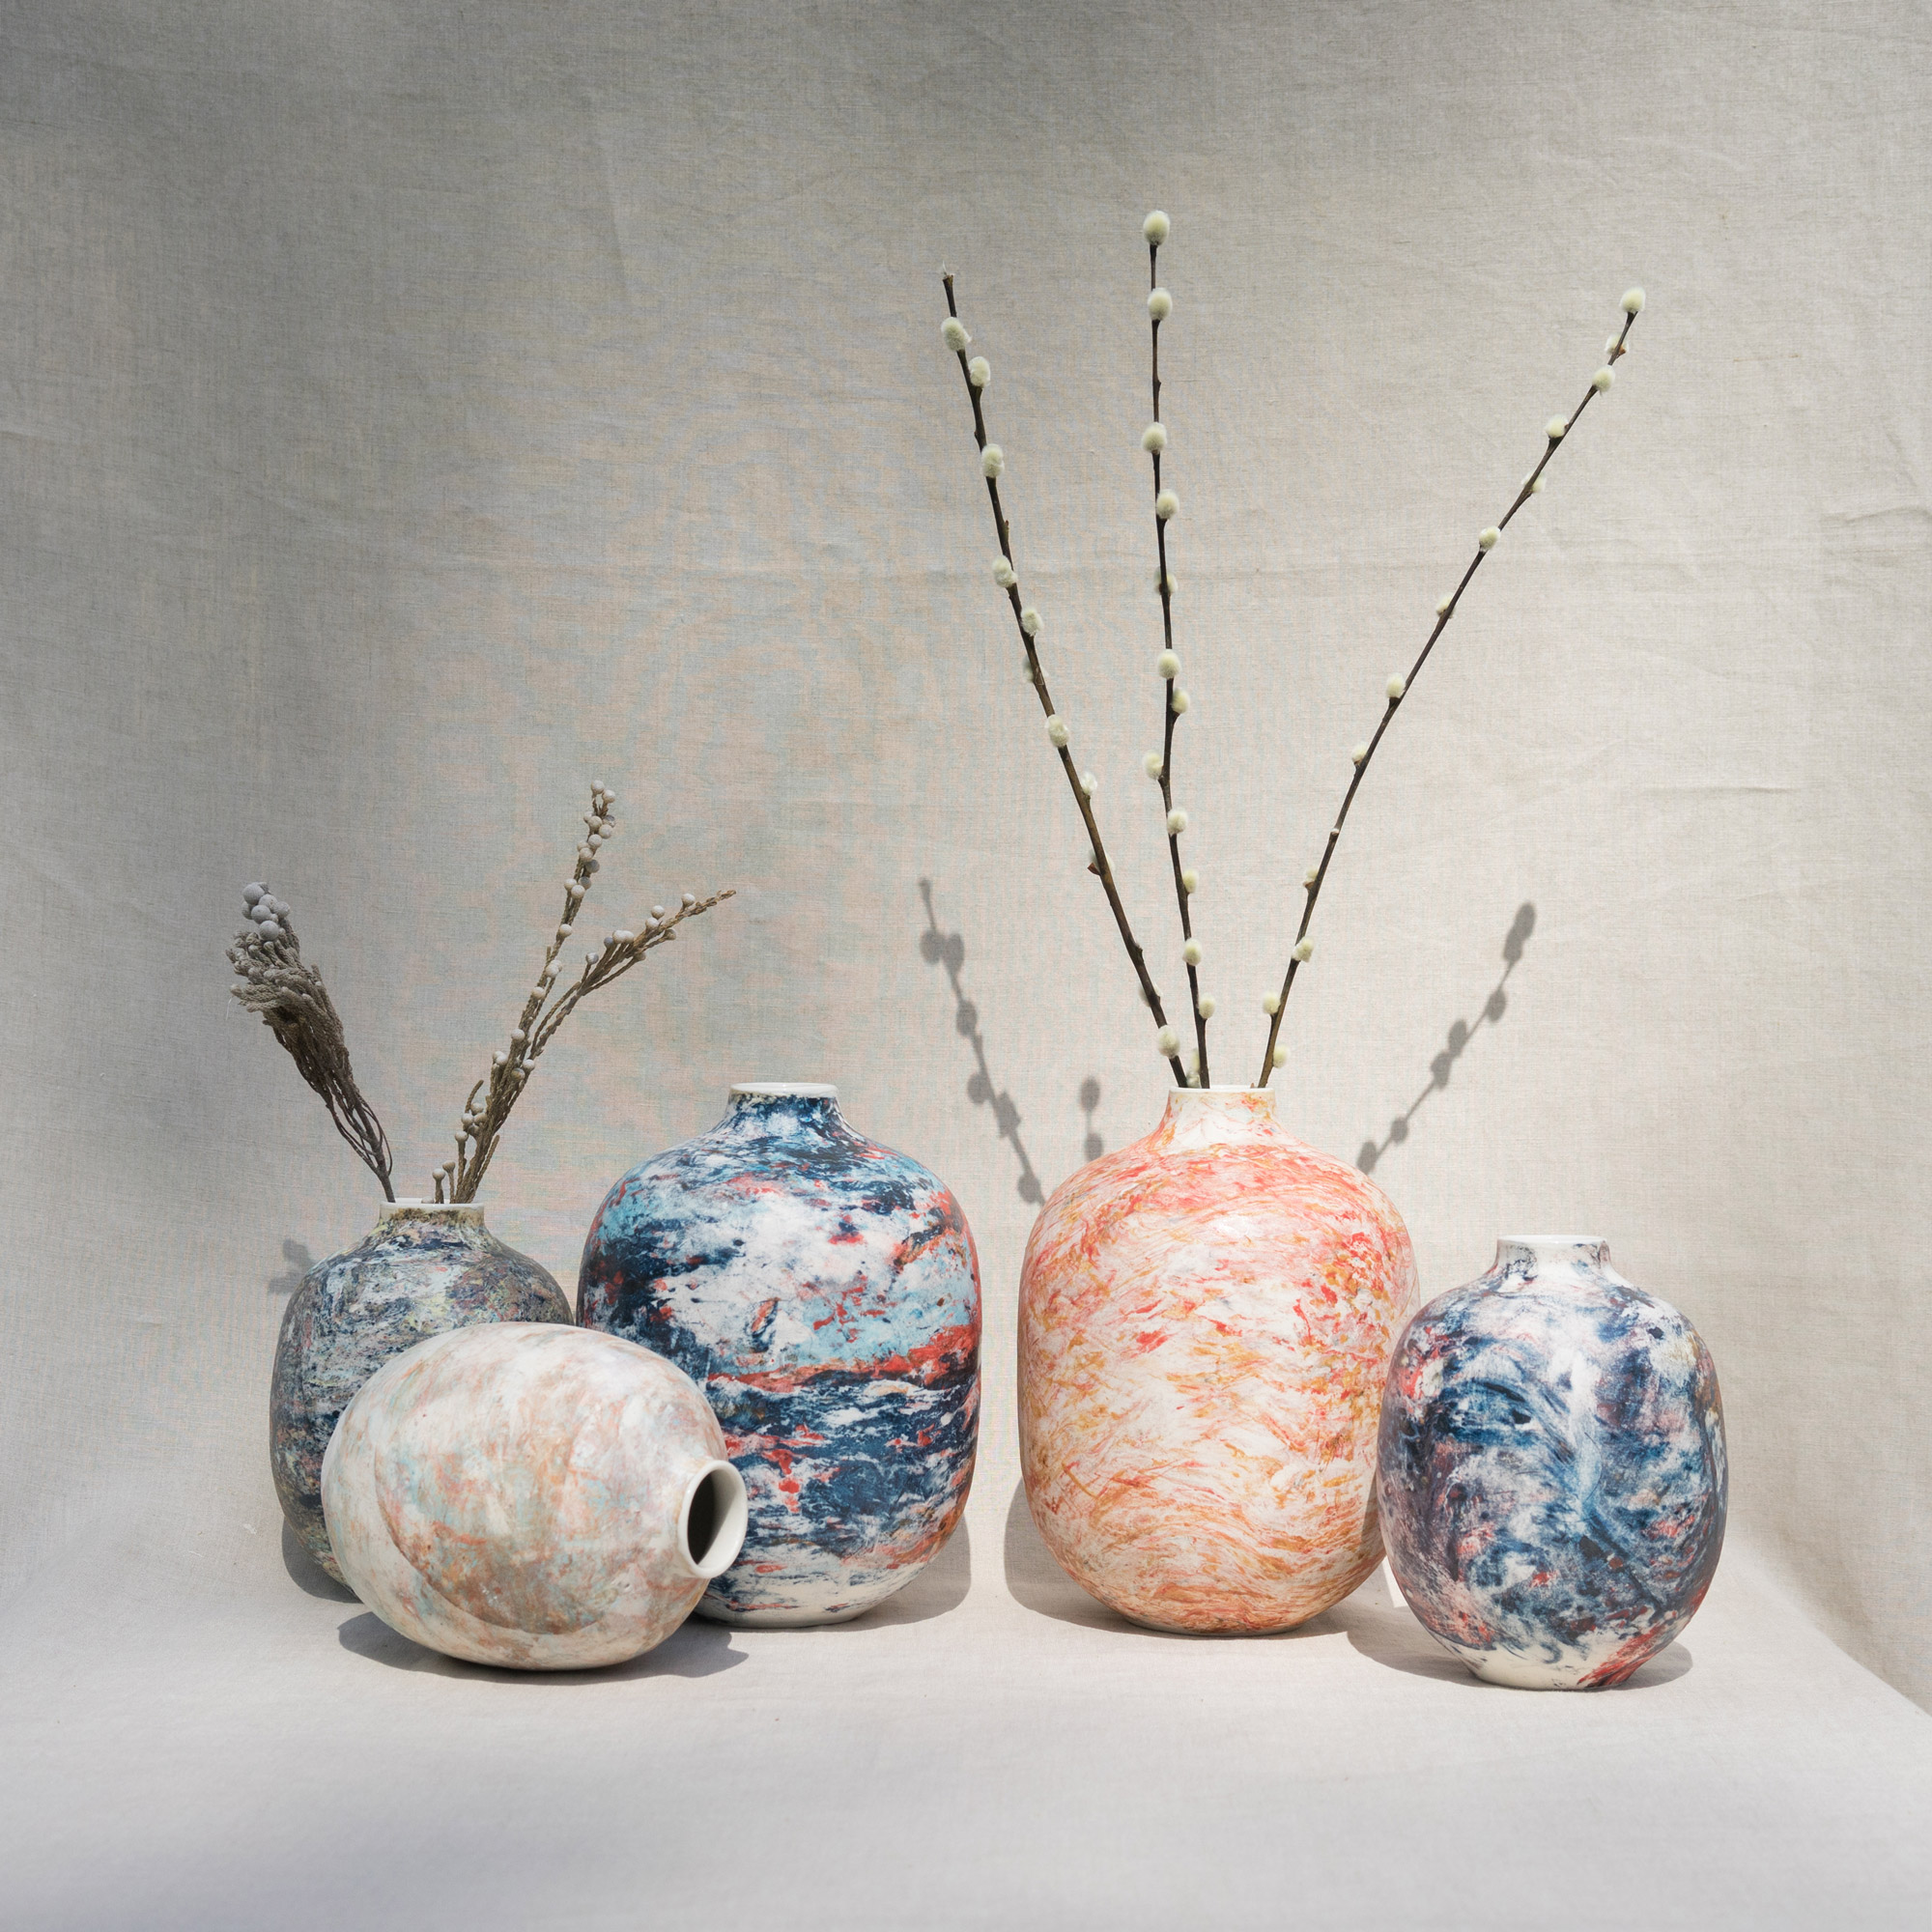 Colourful marble-coloured ceramic vases by Veronika Svabenikova